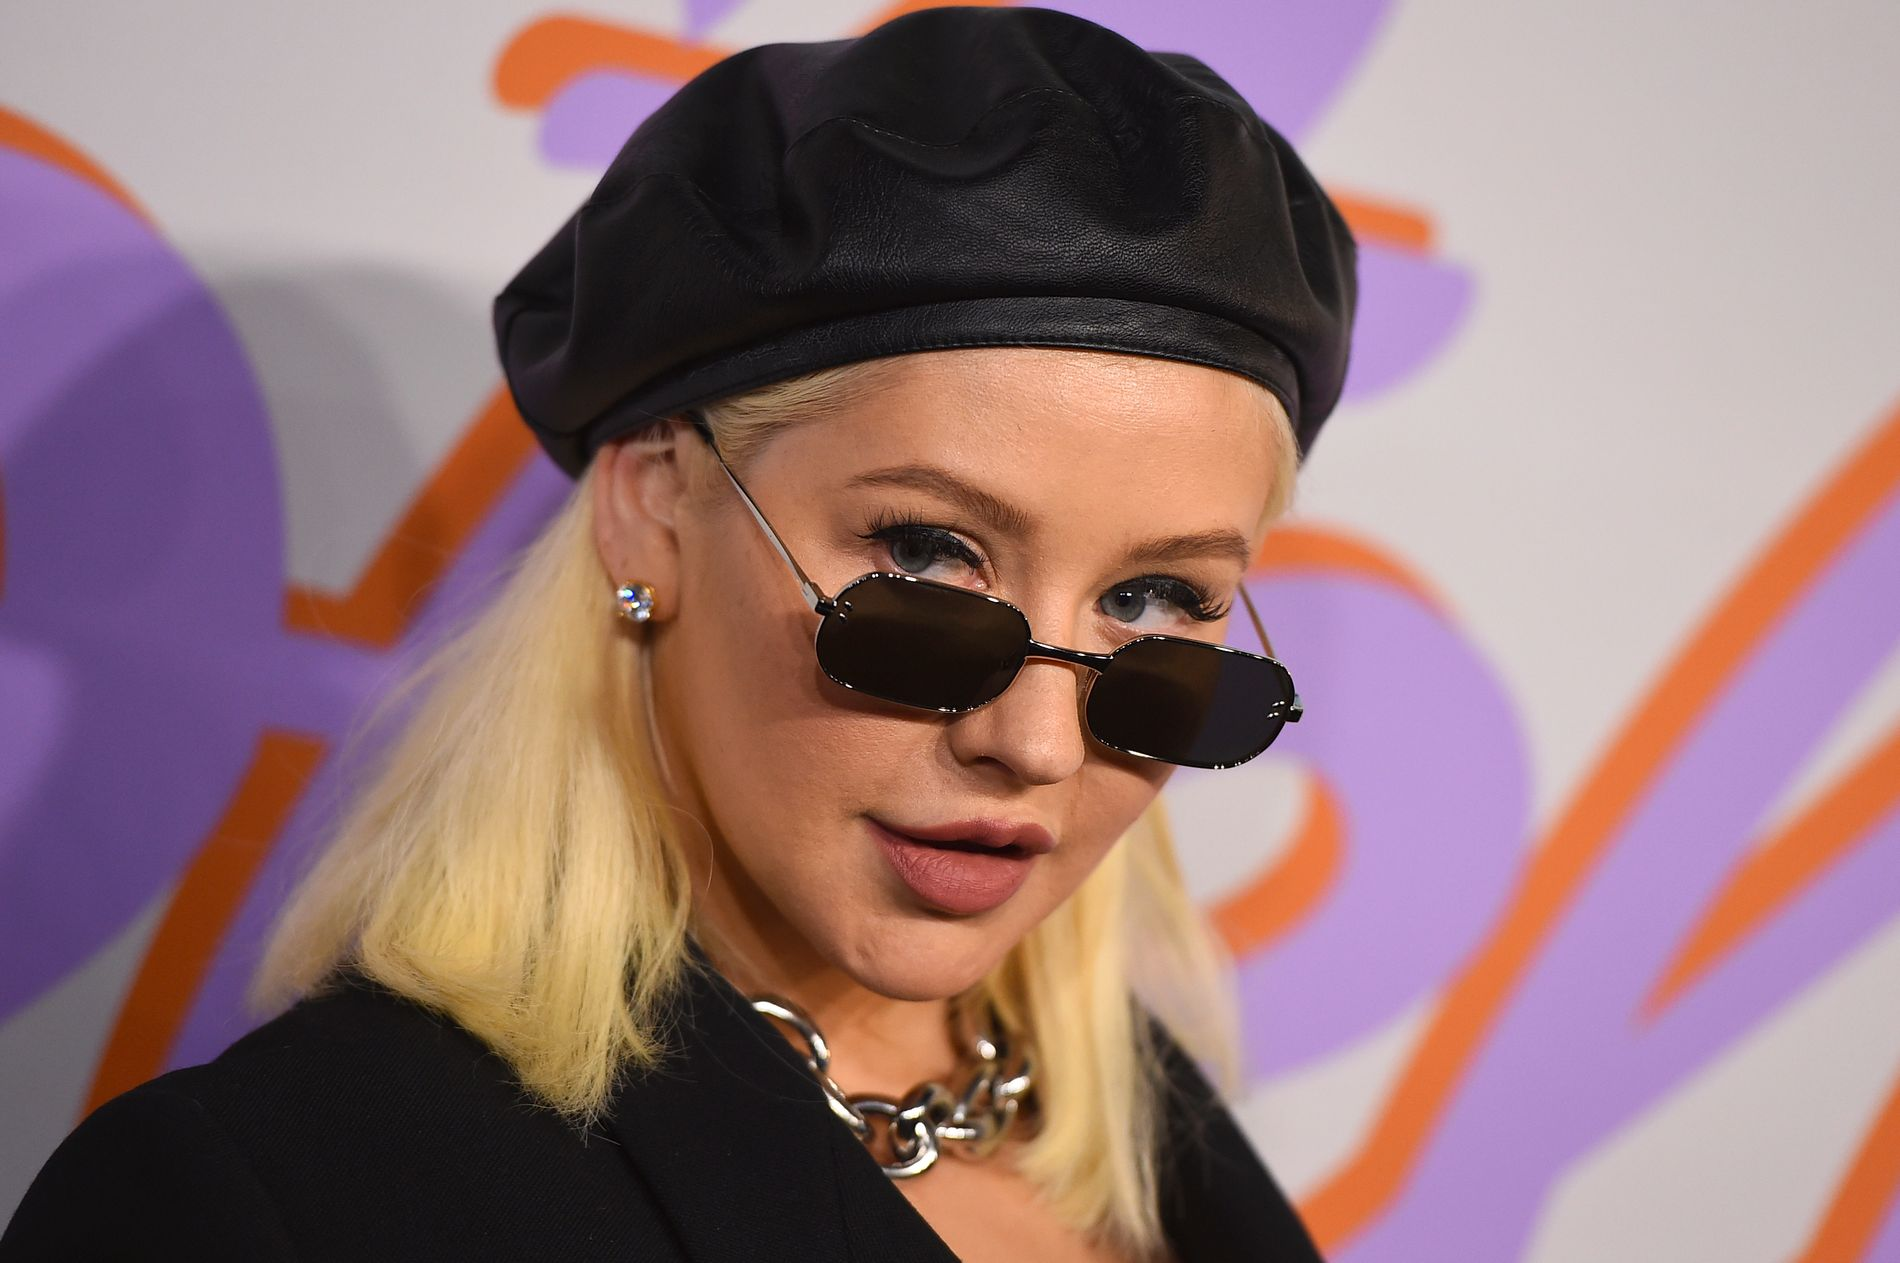 NATURLIG: Christina Aguilera, her på motevisning i Los Angeles i januar, gjennomgår et stilskifte.